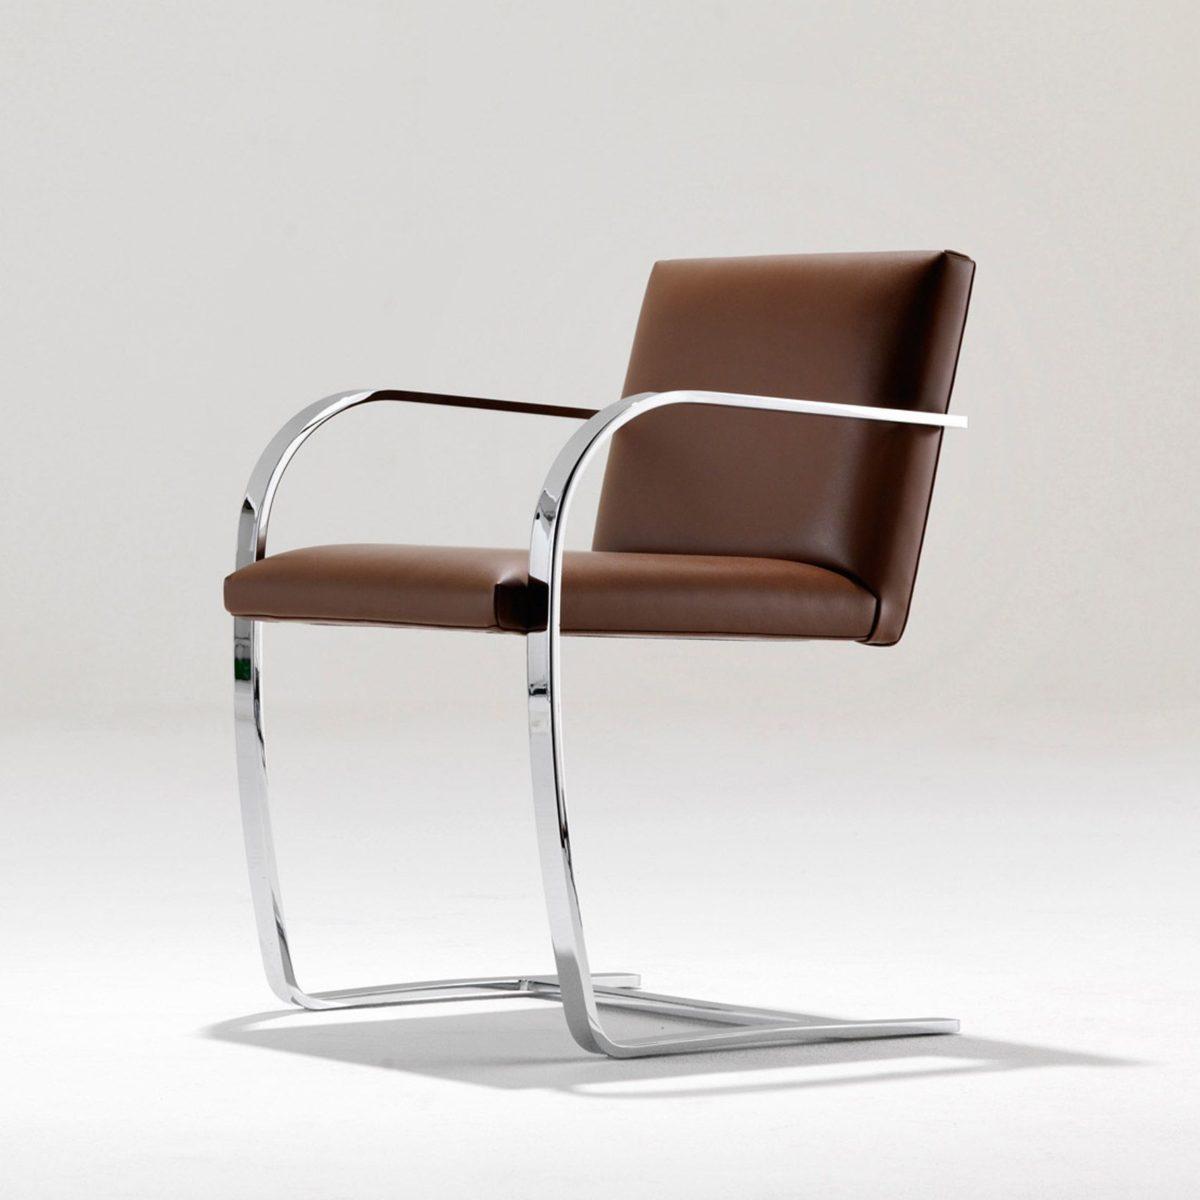 bauhaus-brno-sedia